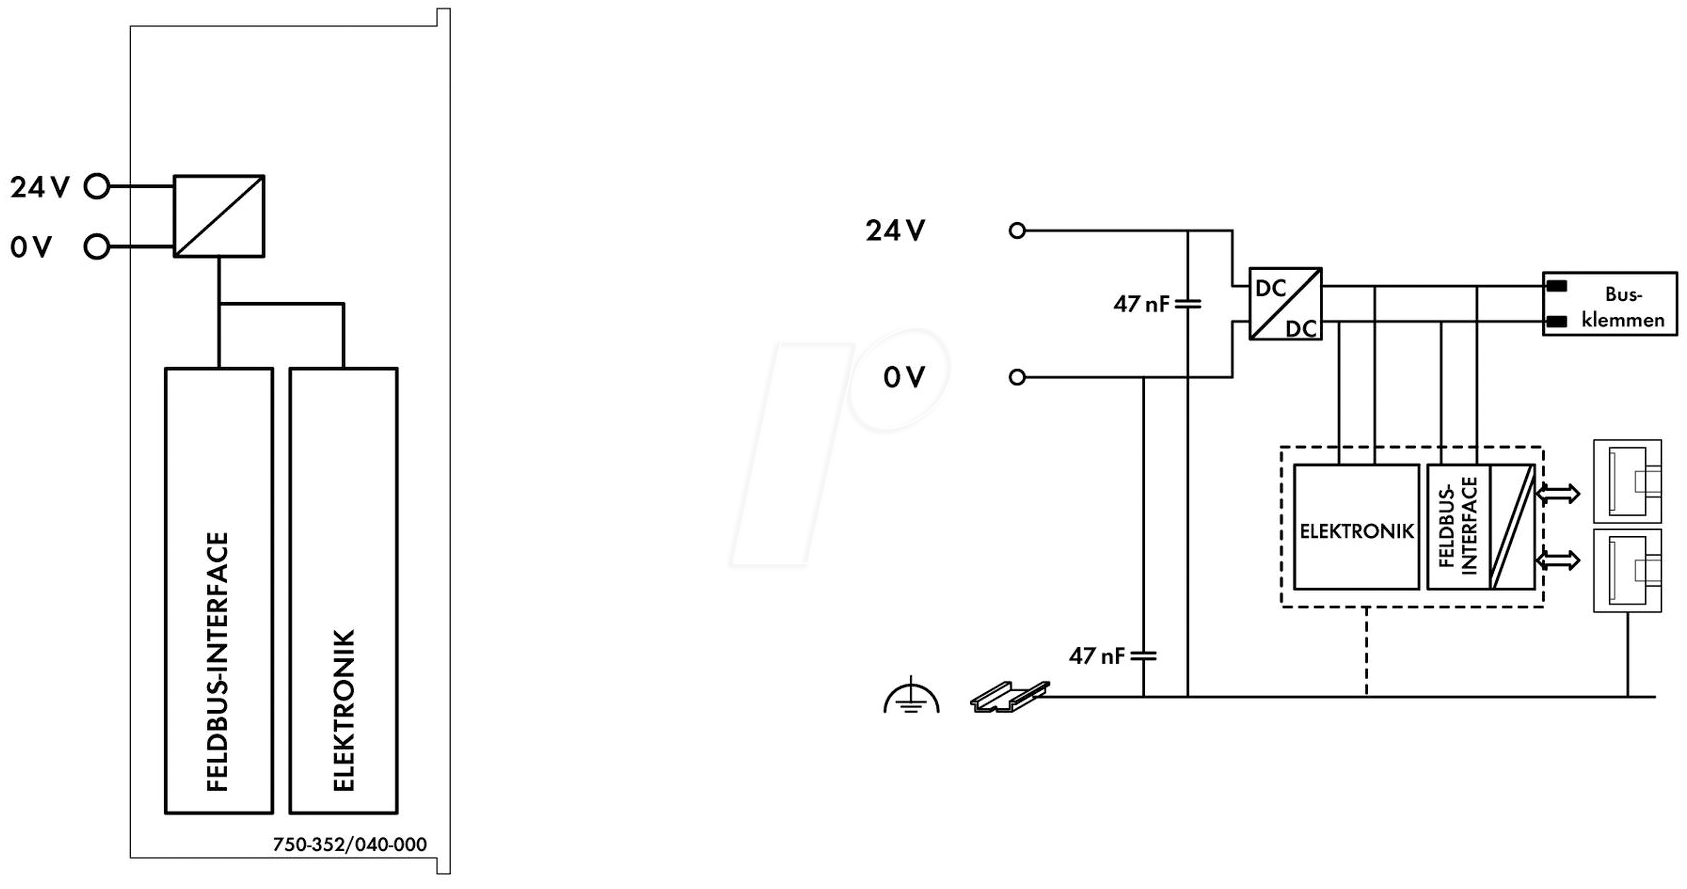 WAGO 750-352-40 - Fieldbus couplers ETHERNET, XTR